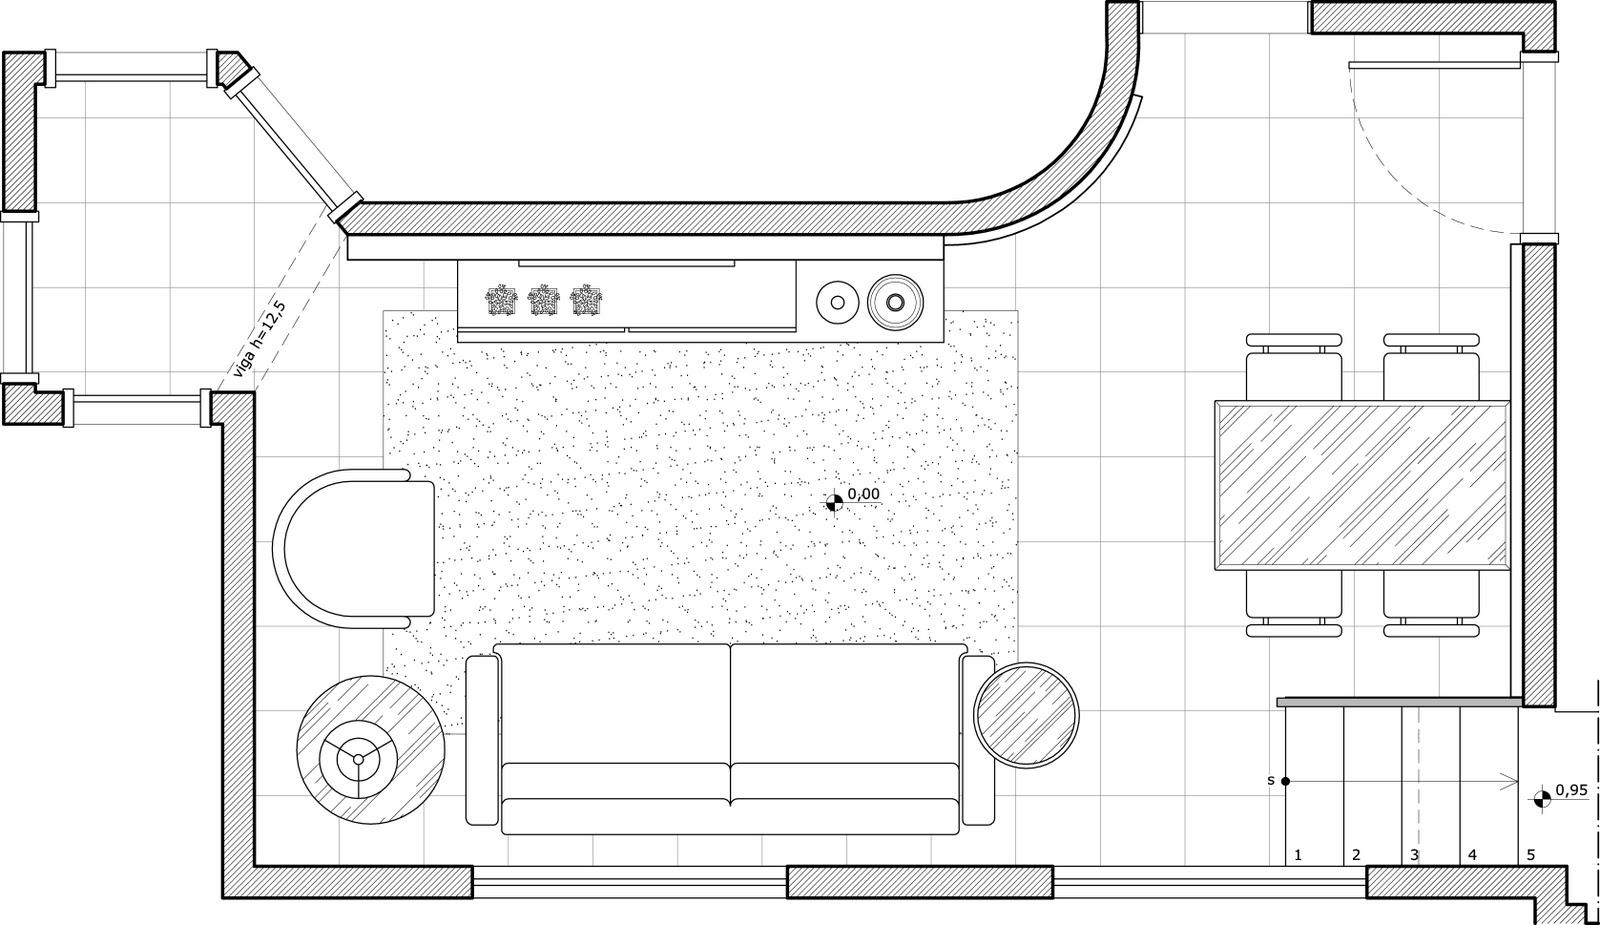 Layout Da Sala De Estar ~ Planta das salas com o layout proposto